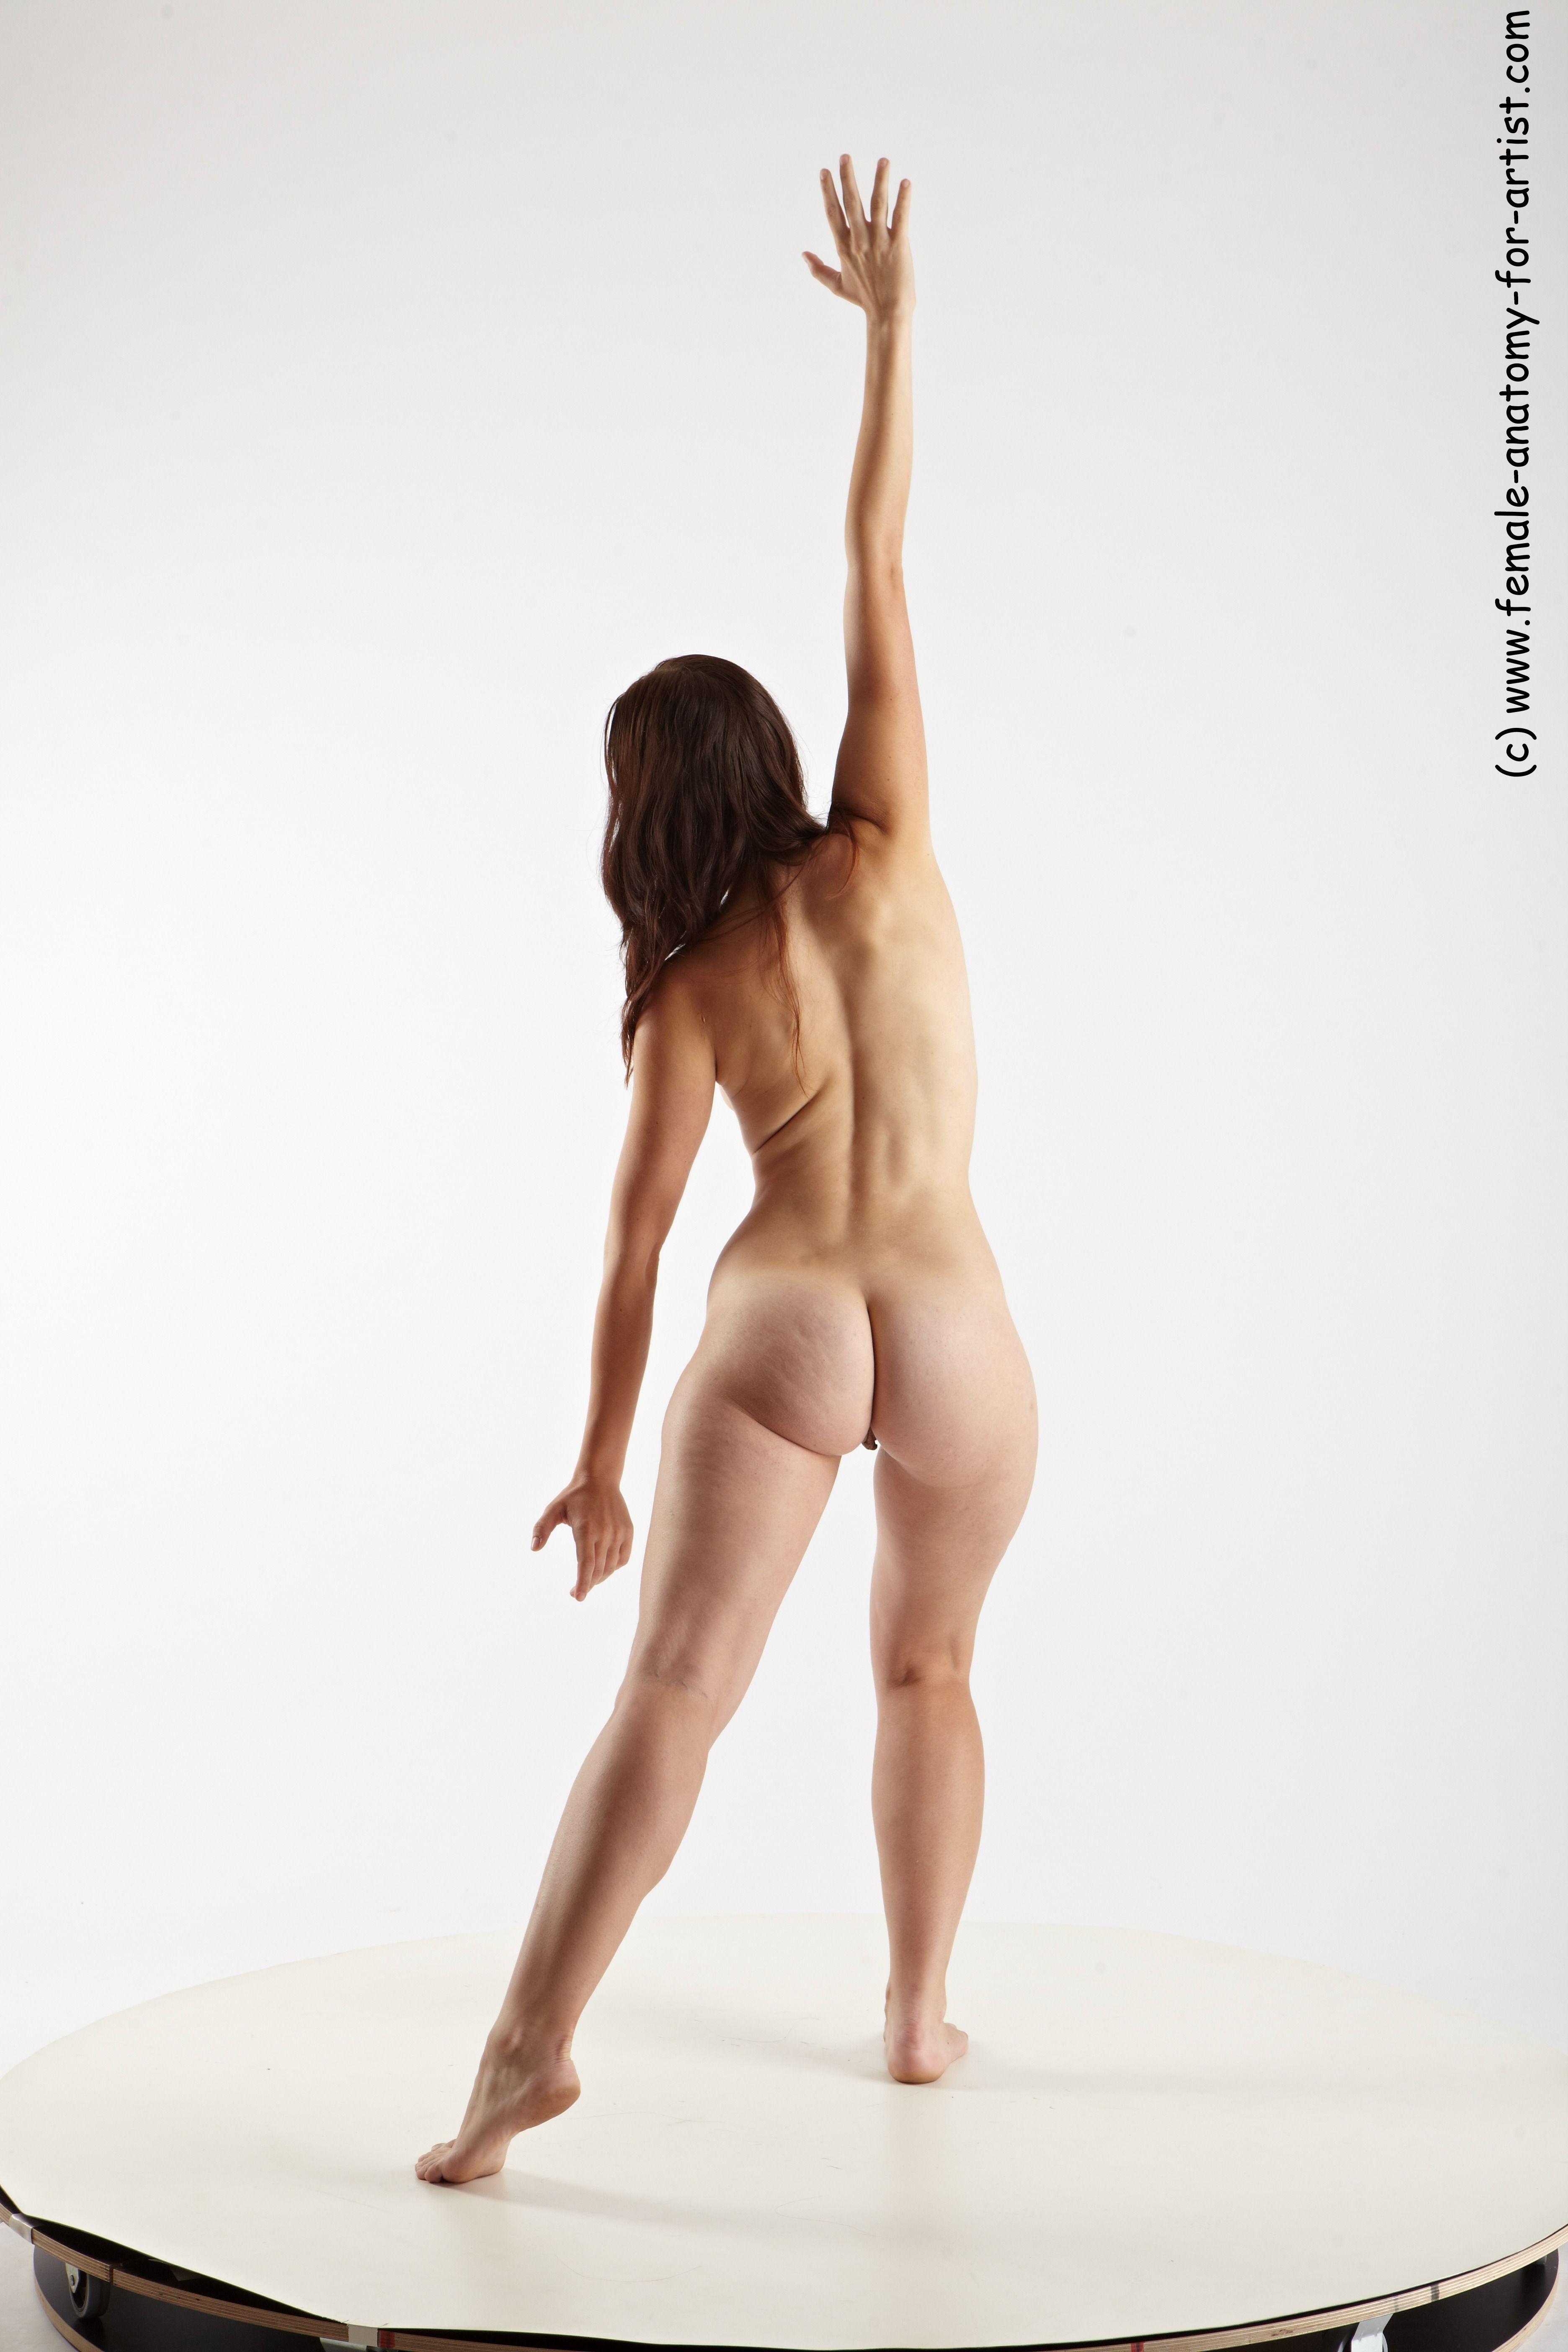 Women nude woman standing pose nsfw hot